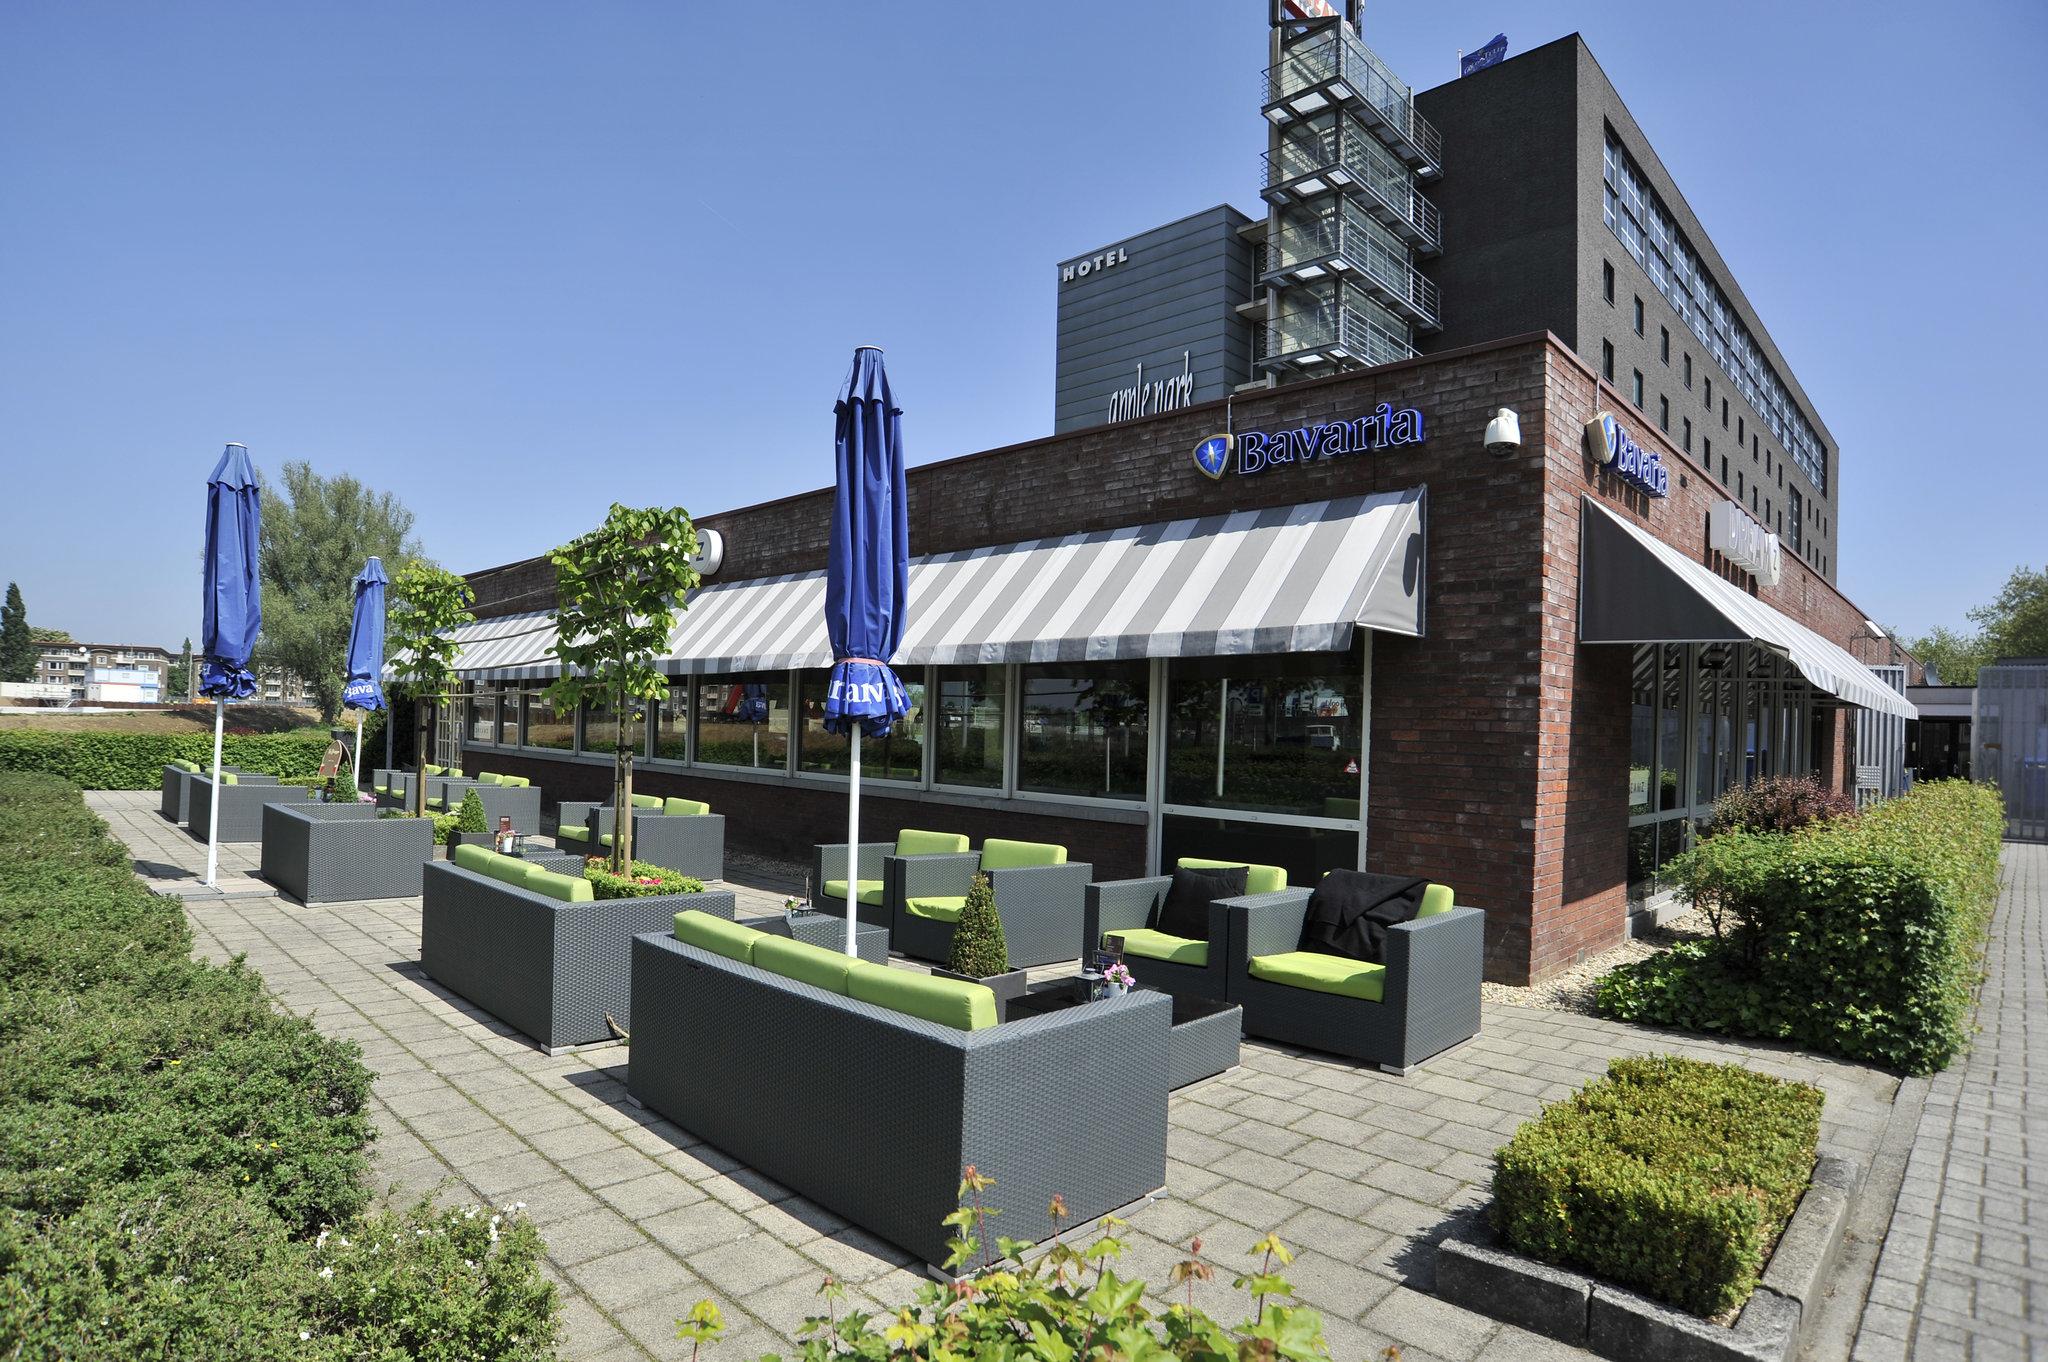 Apple Park Hotel Maastricht - room photo 1804944